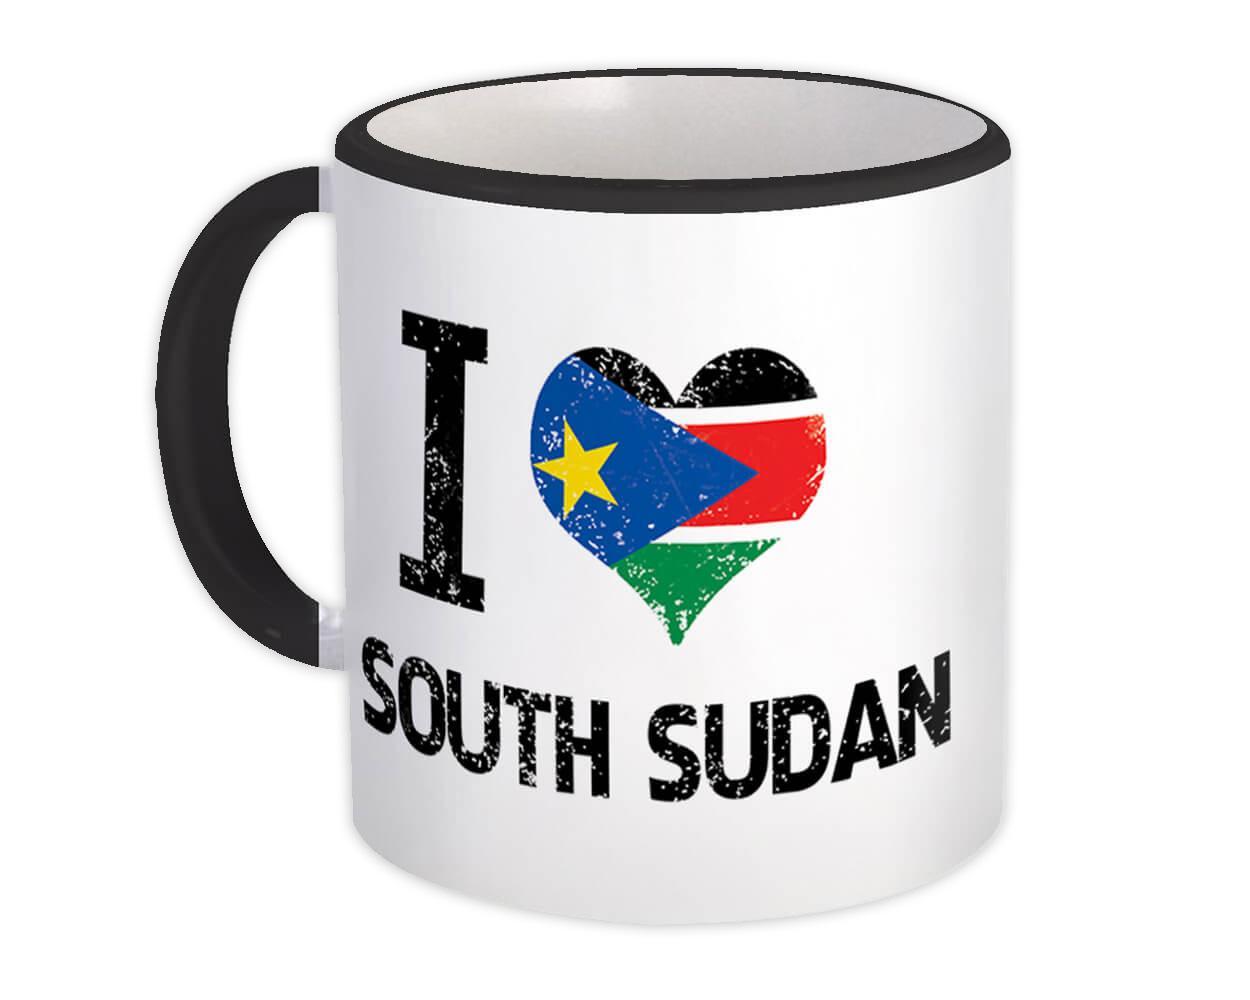 I Love South Sudan : Gift Mug Heart Flag Country Crest South Sudanese Expat